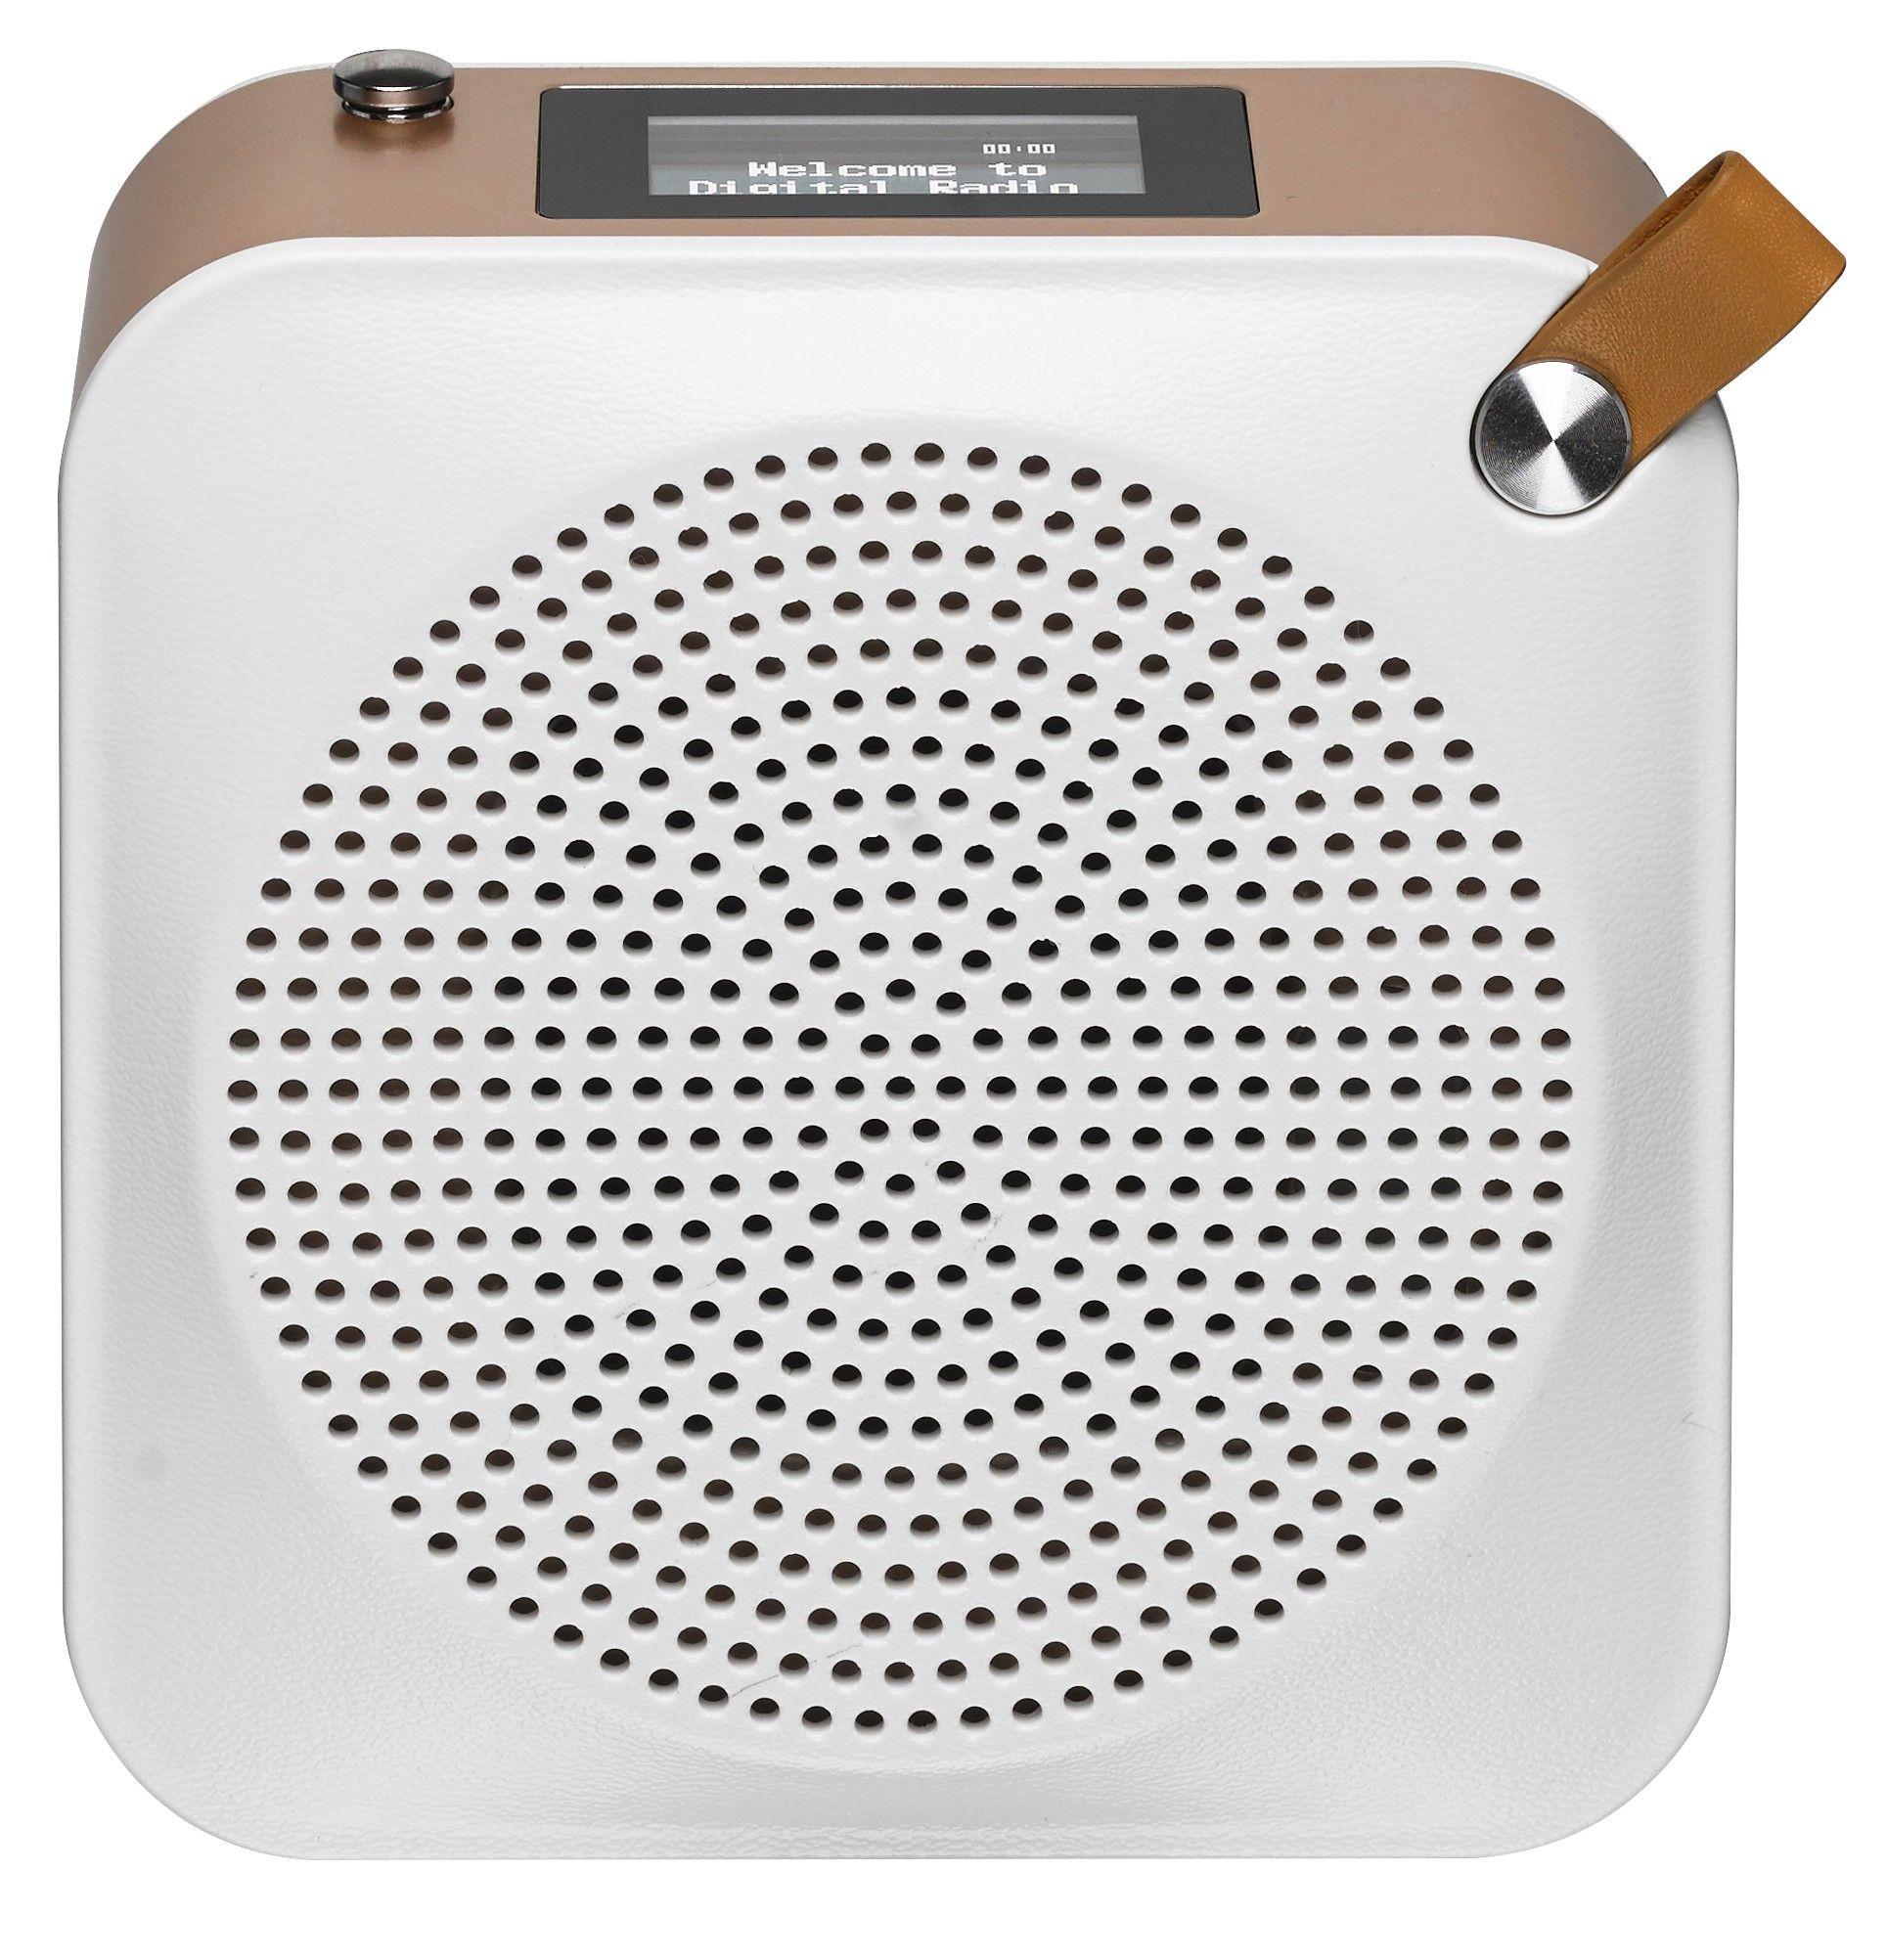 Populære Sandstrøm Constellation Aria DAB+/FM radio (champagne) - Radio JQ-88